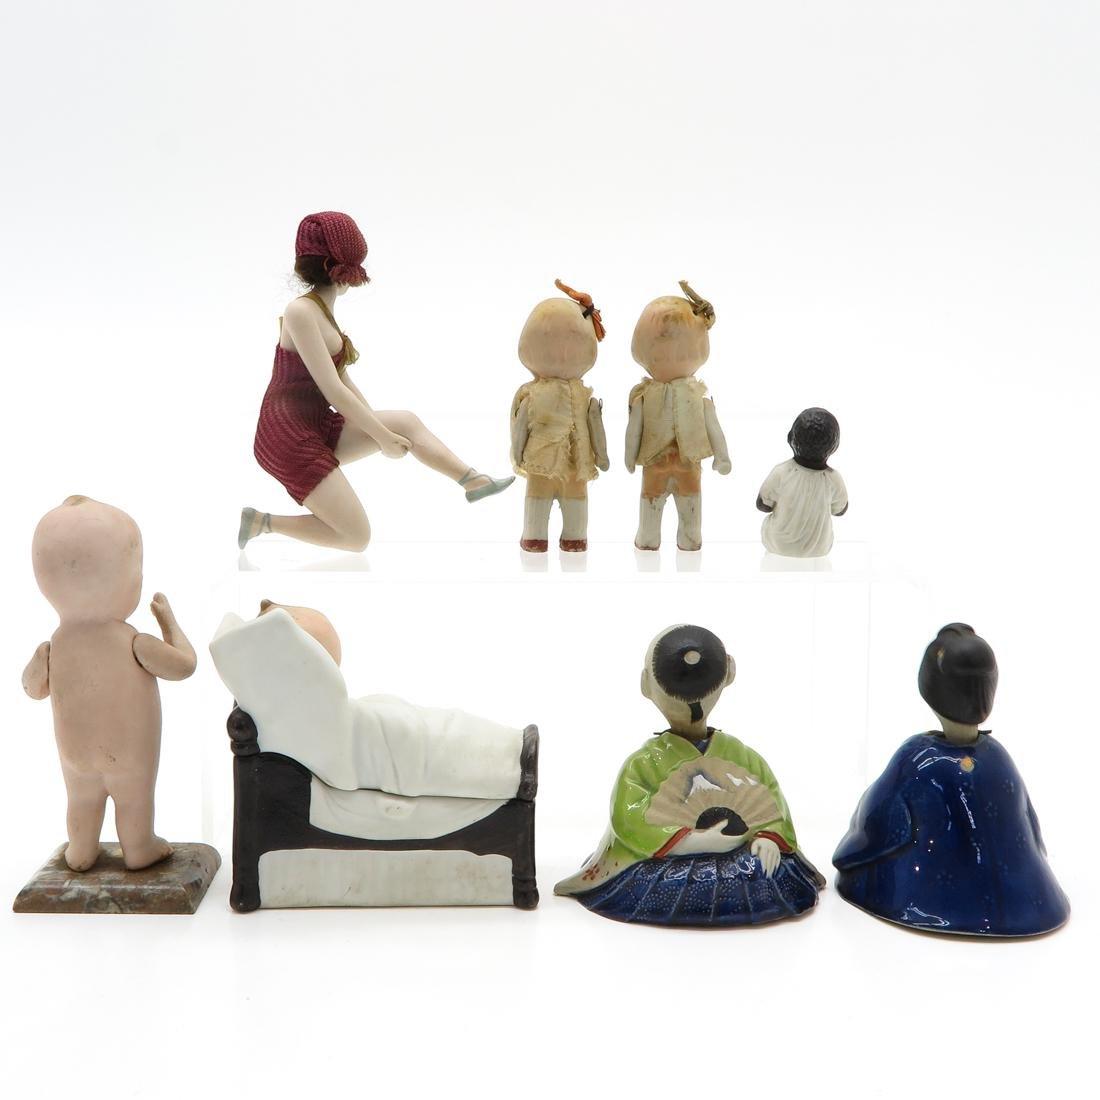 Diverse Lot of 8 Dolls - 2